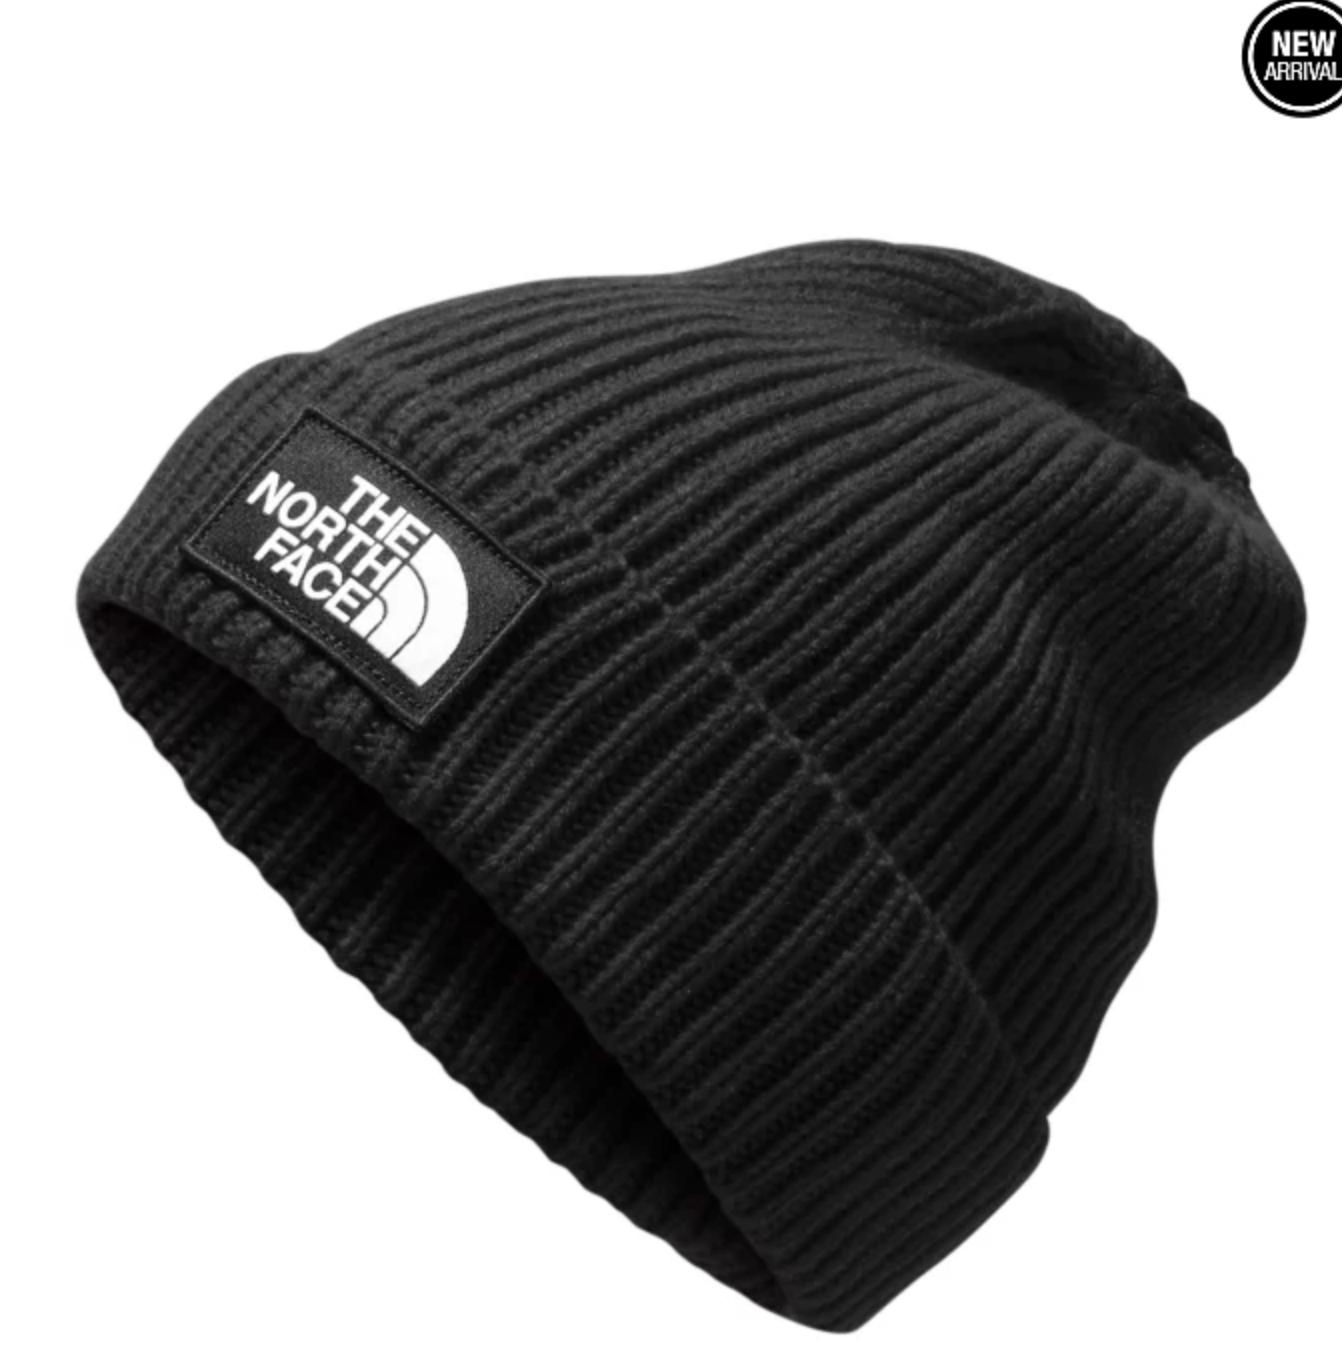 Tnf Logo Box Cuffed Beanie The North Face In 2020 North Face Coat North Face Hat North Face Tnf